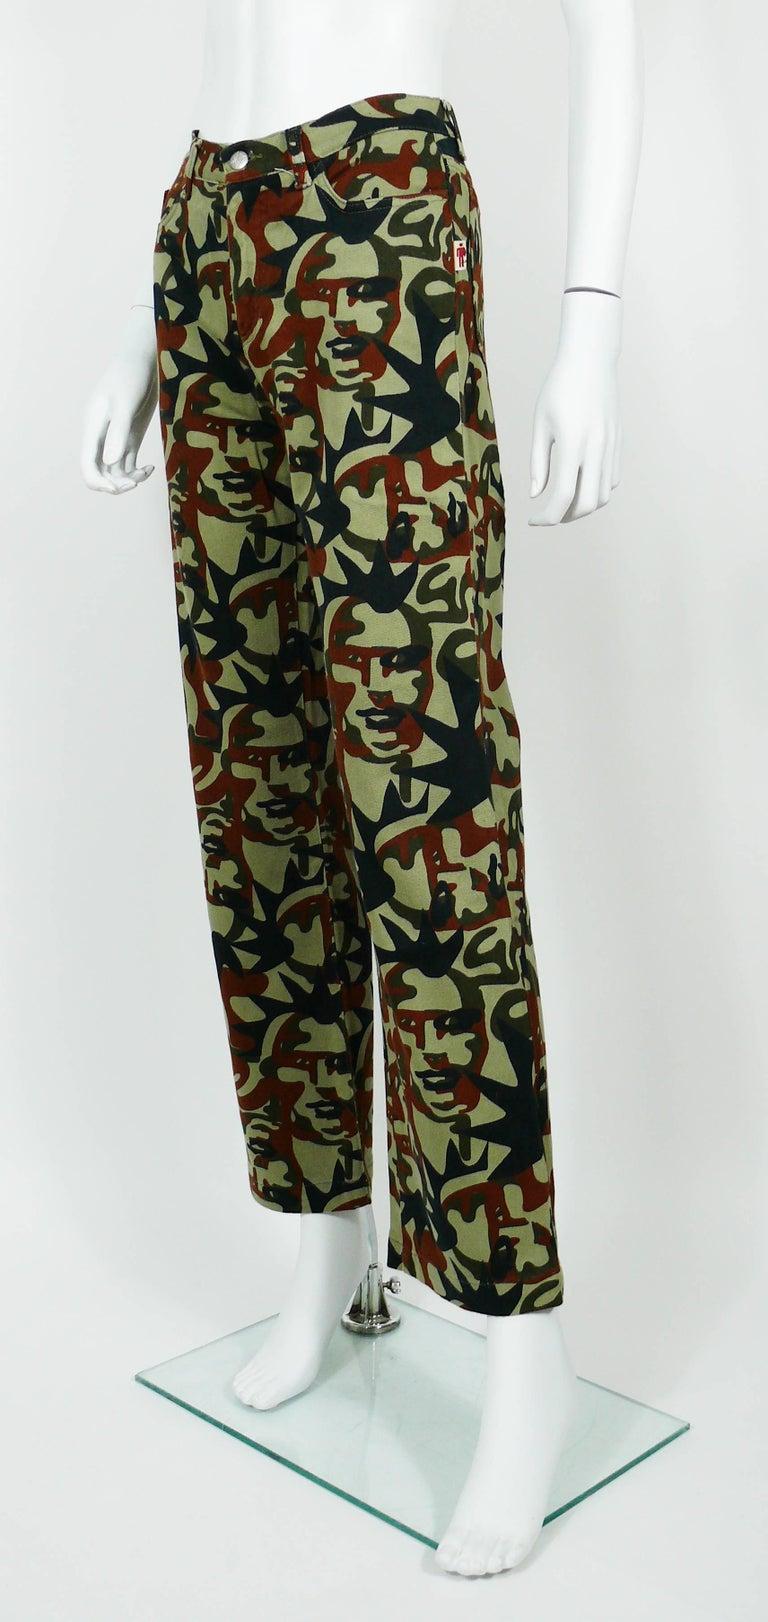 Women's Jean Paul Gaultier Vintage Camouflage Faces Pants Trousers For Sale